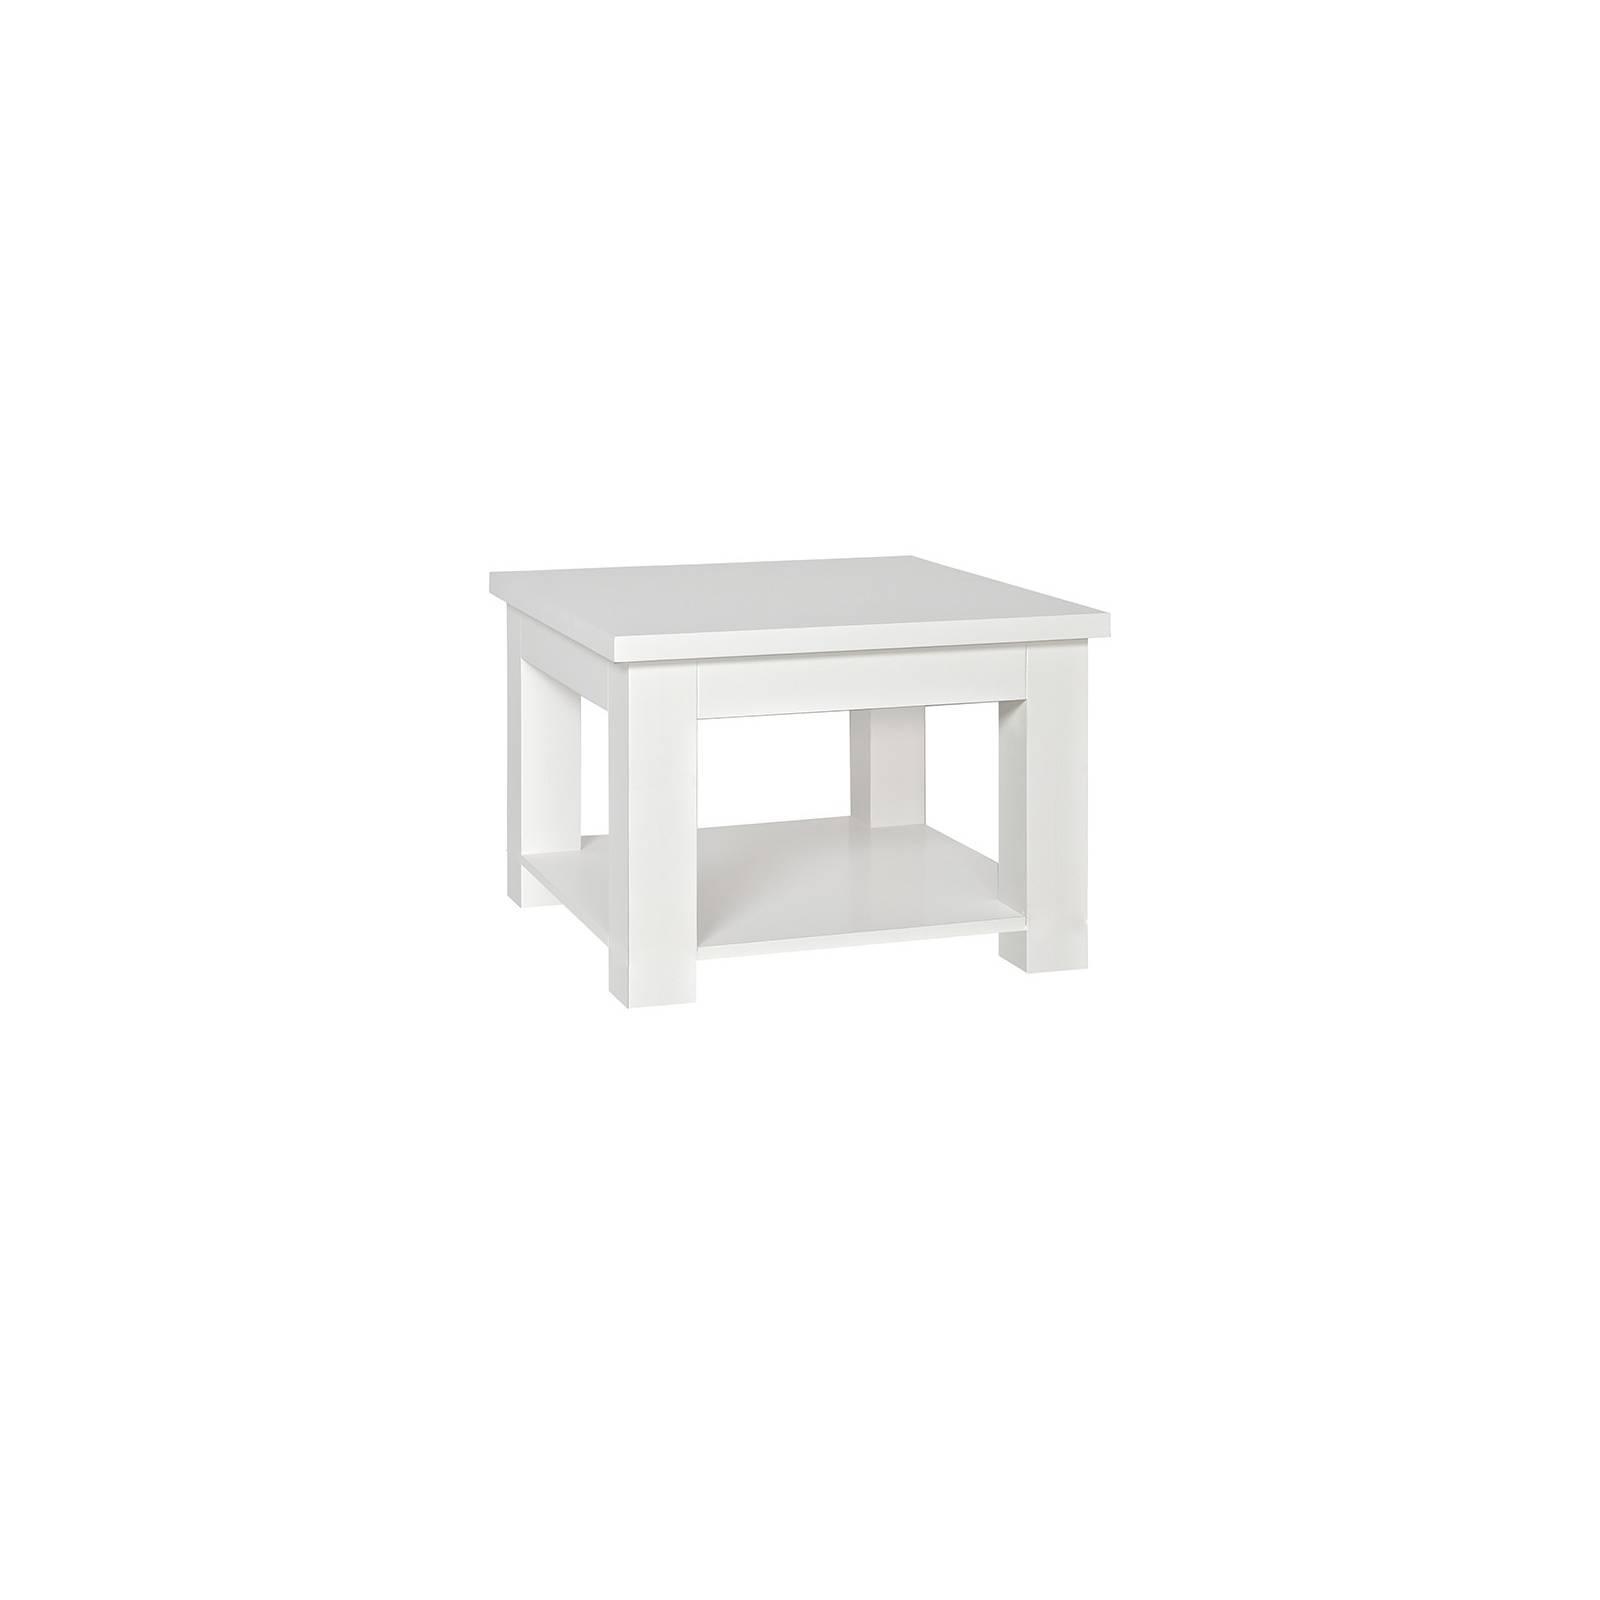 Chevet / Bout De Canapé Victoria Pin Massif - meuble shabby chic